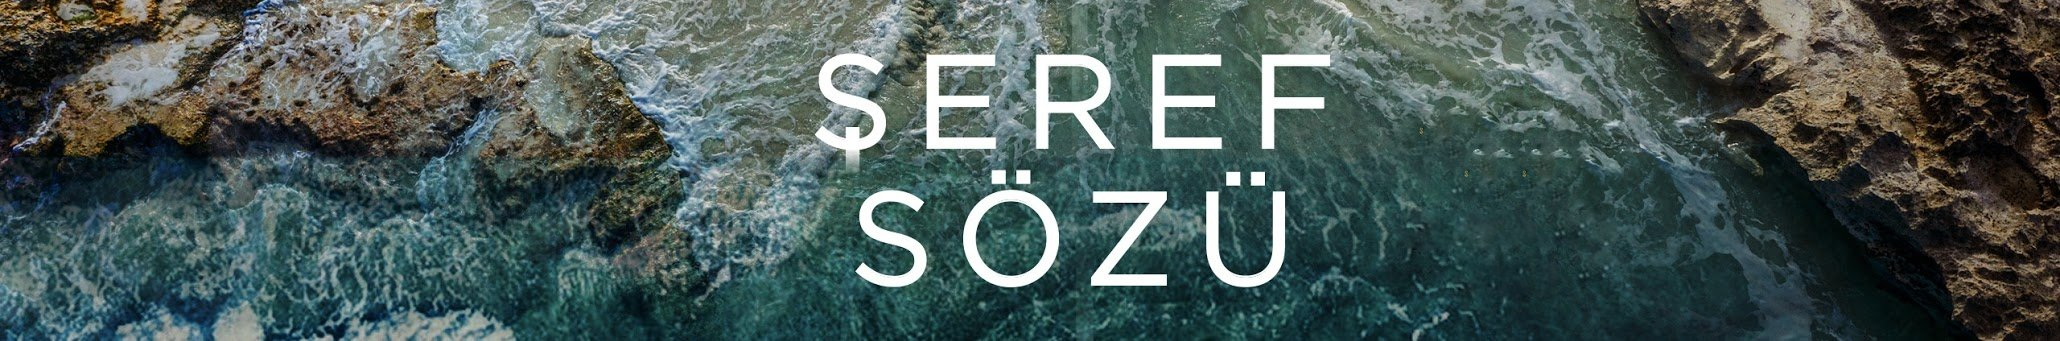 Seref Sozu Season 1 English subtitles | Word Of Honor